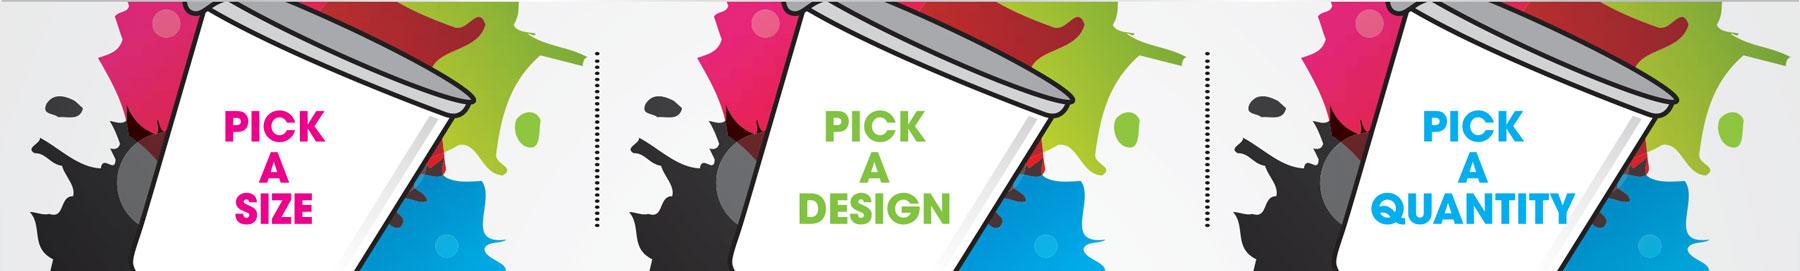 PrintMyCup.com | Pick size | Pick design | Pick quantity